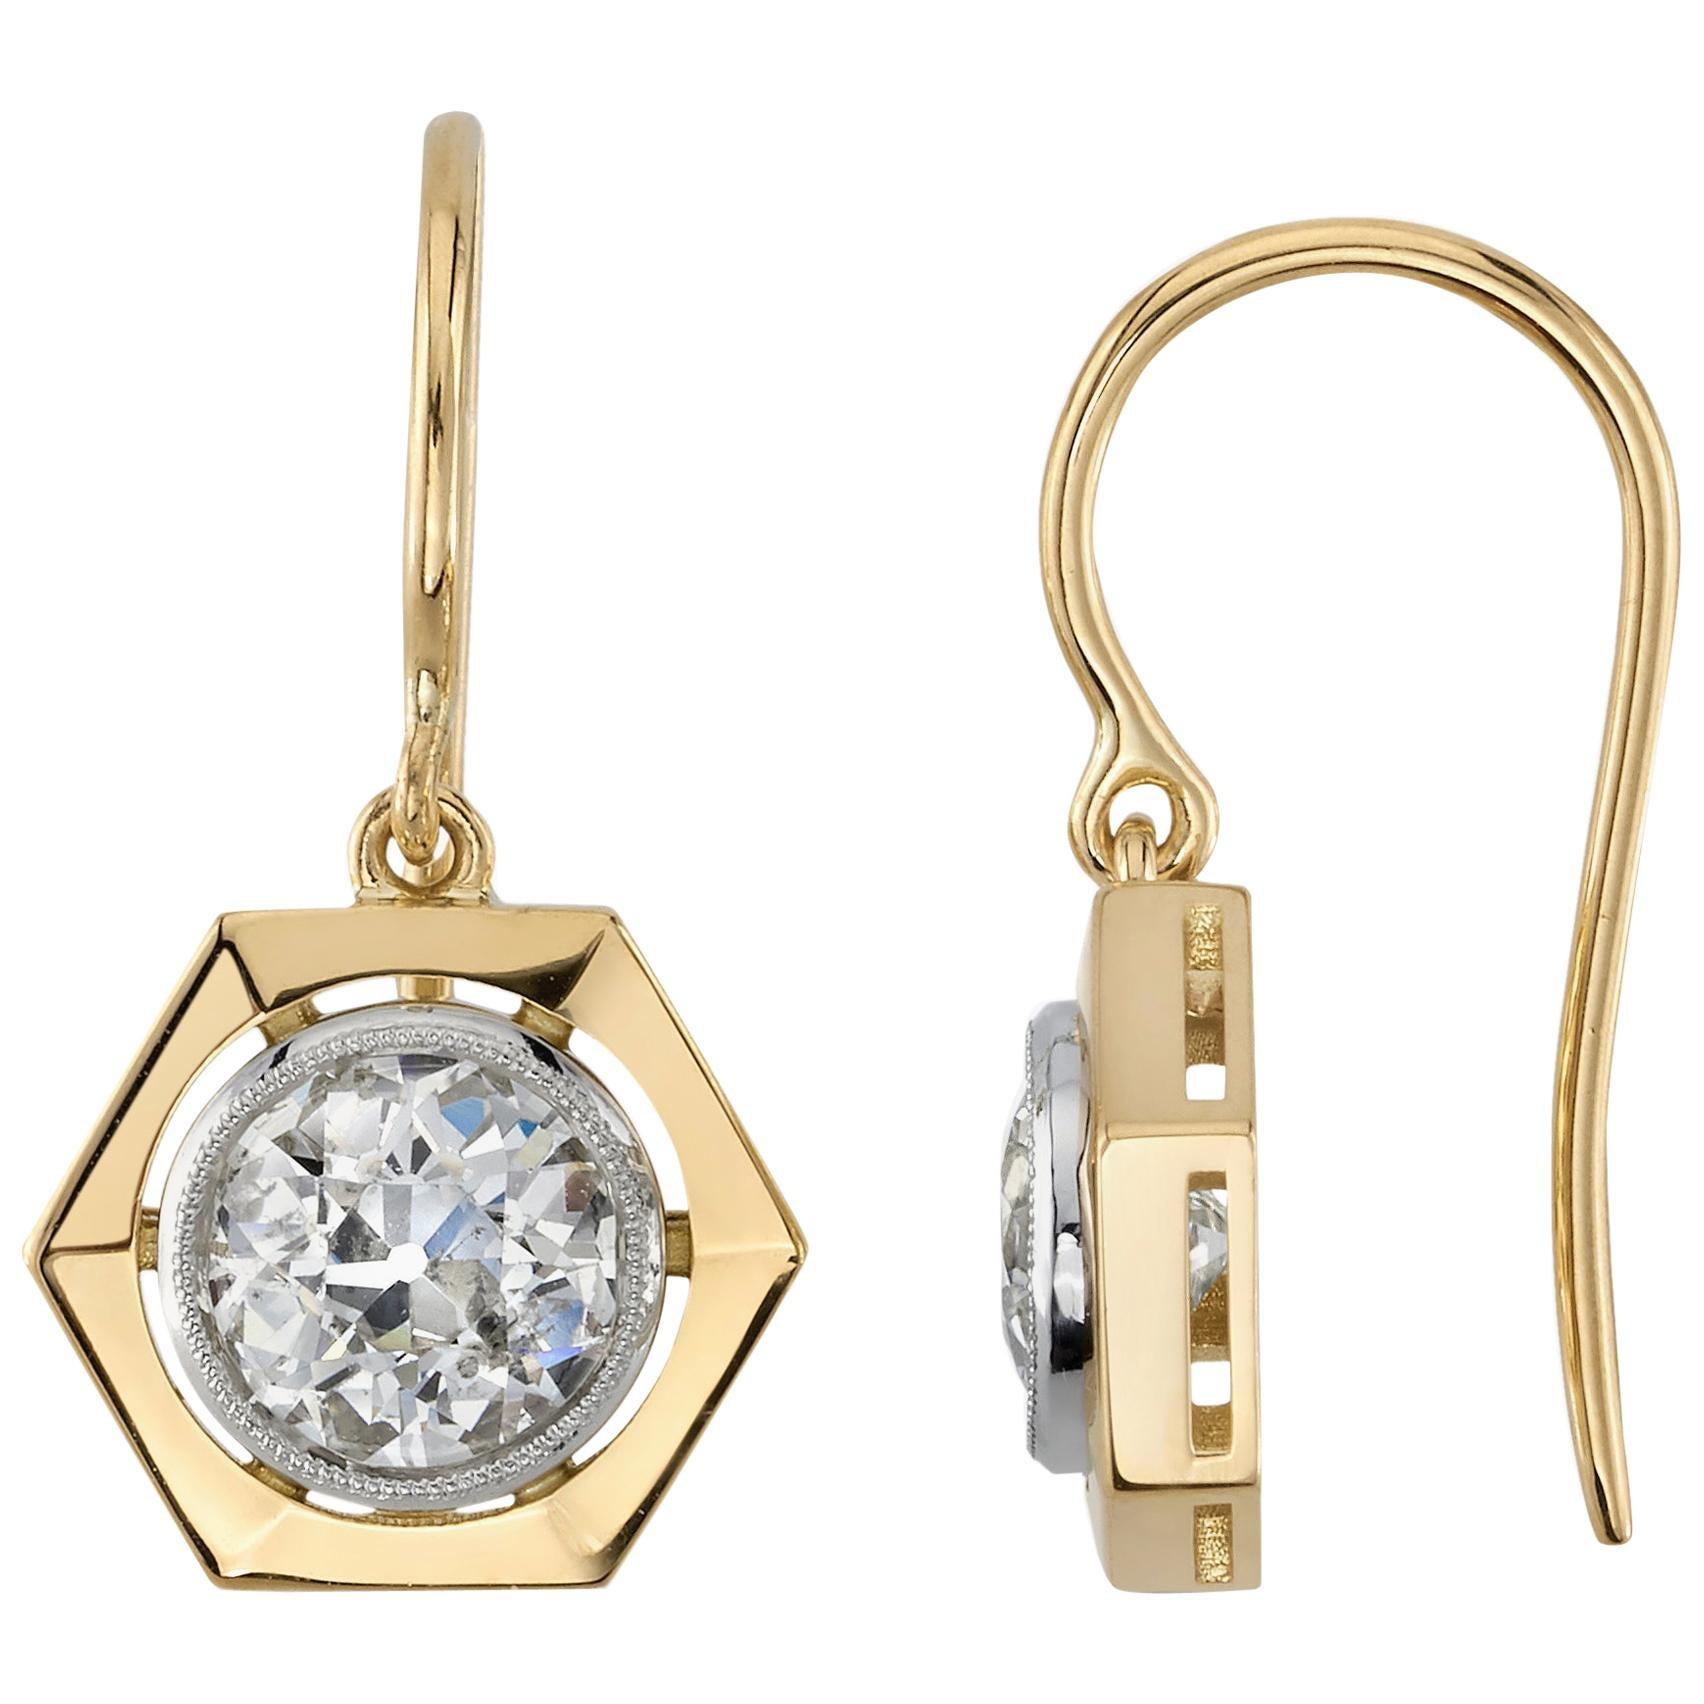 Handcrafted Tisha Old European Cut Diamond Drop Earrings by Single Stone